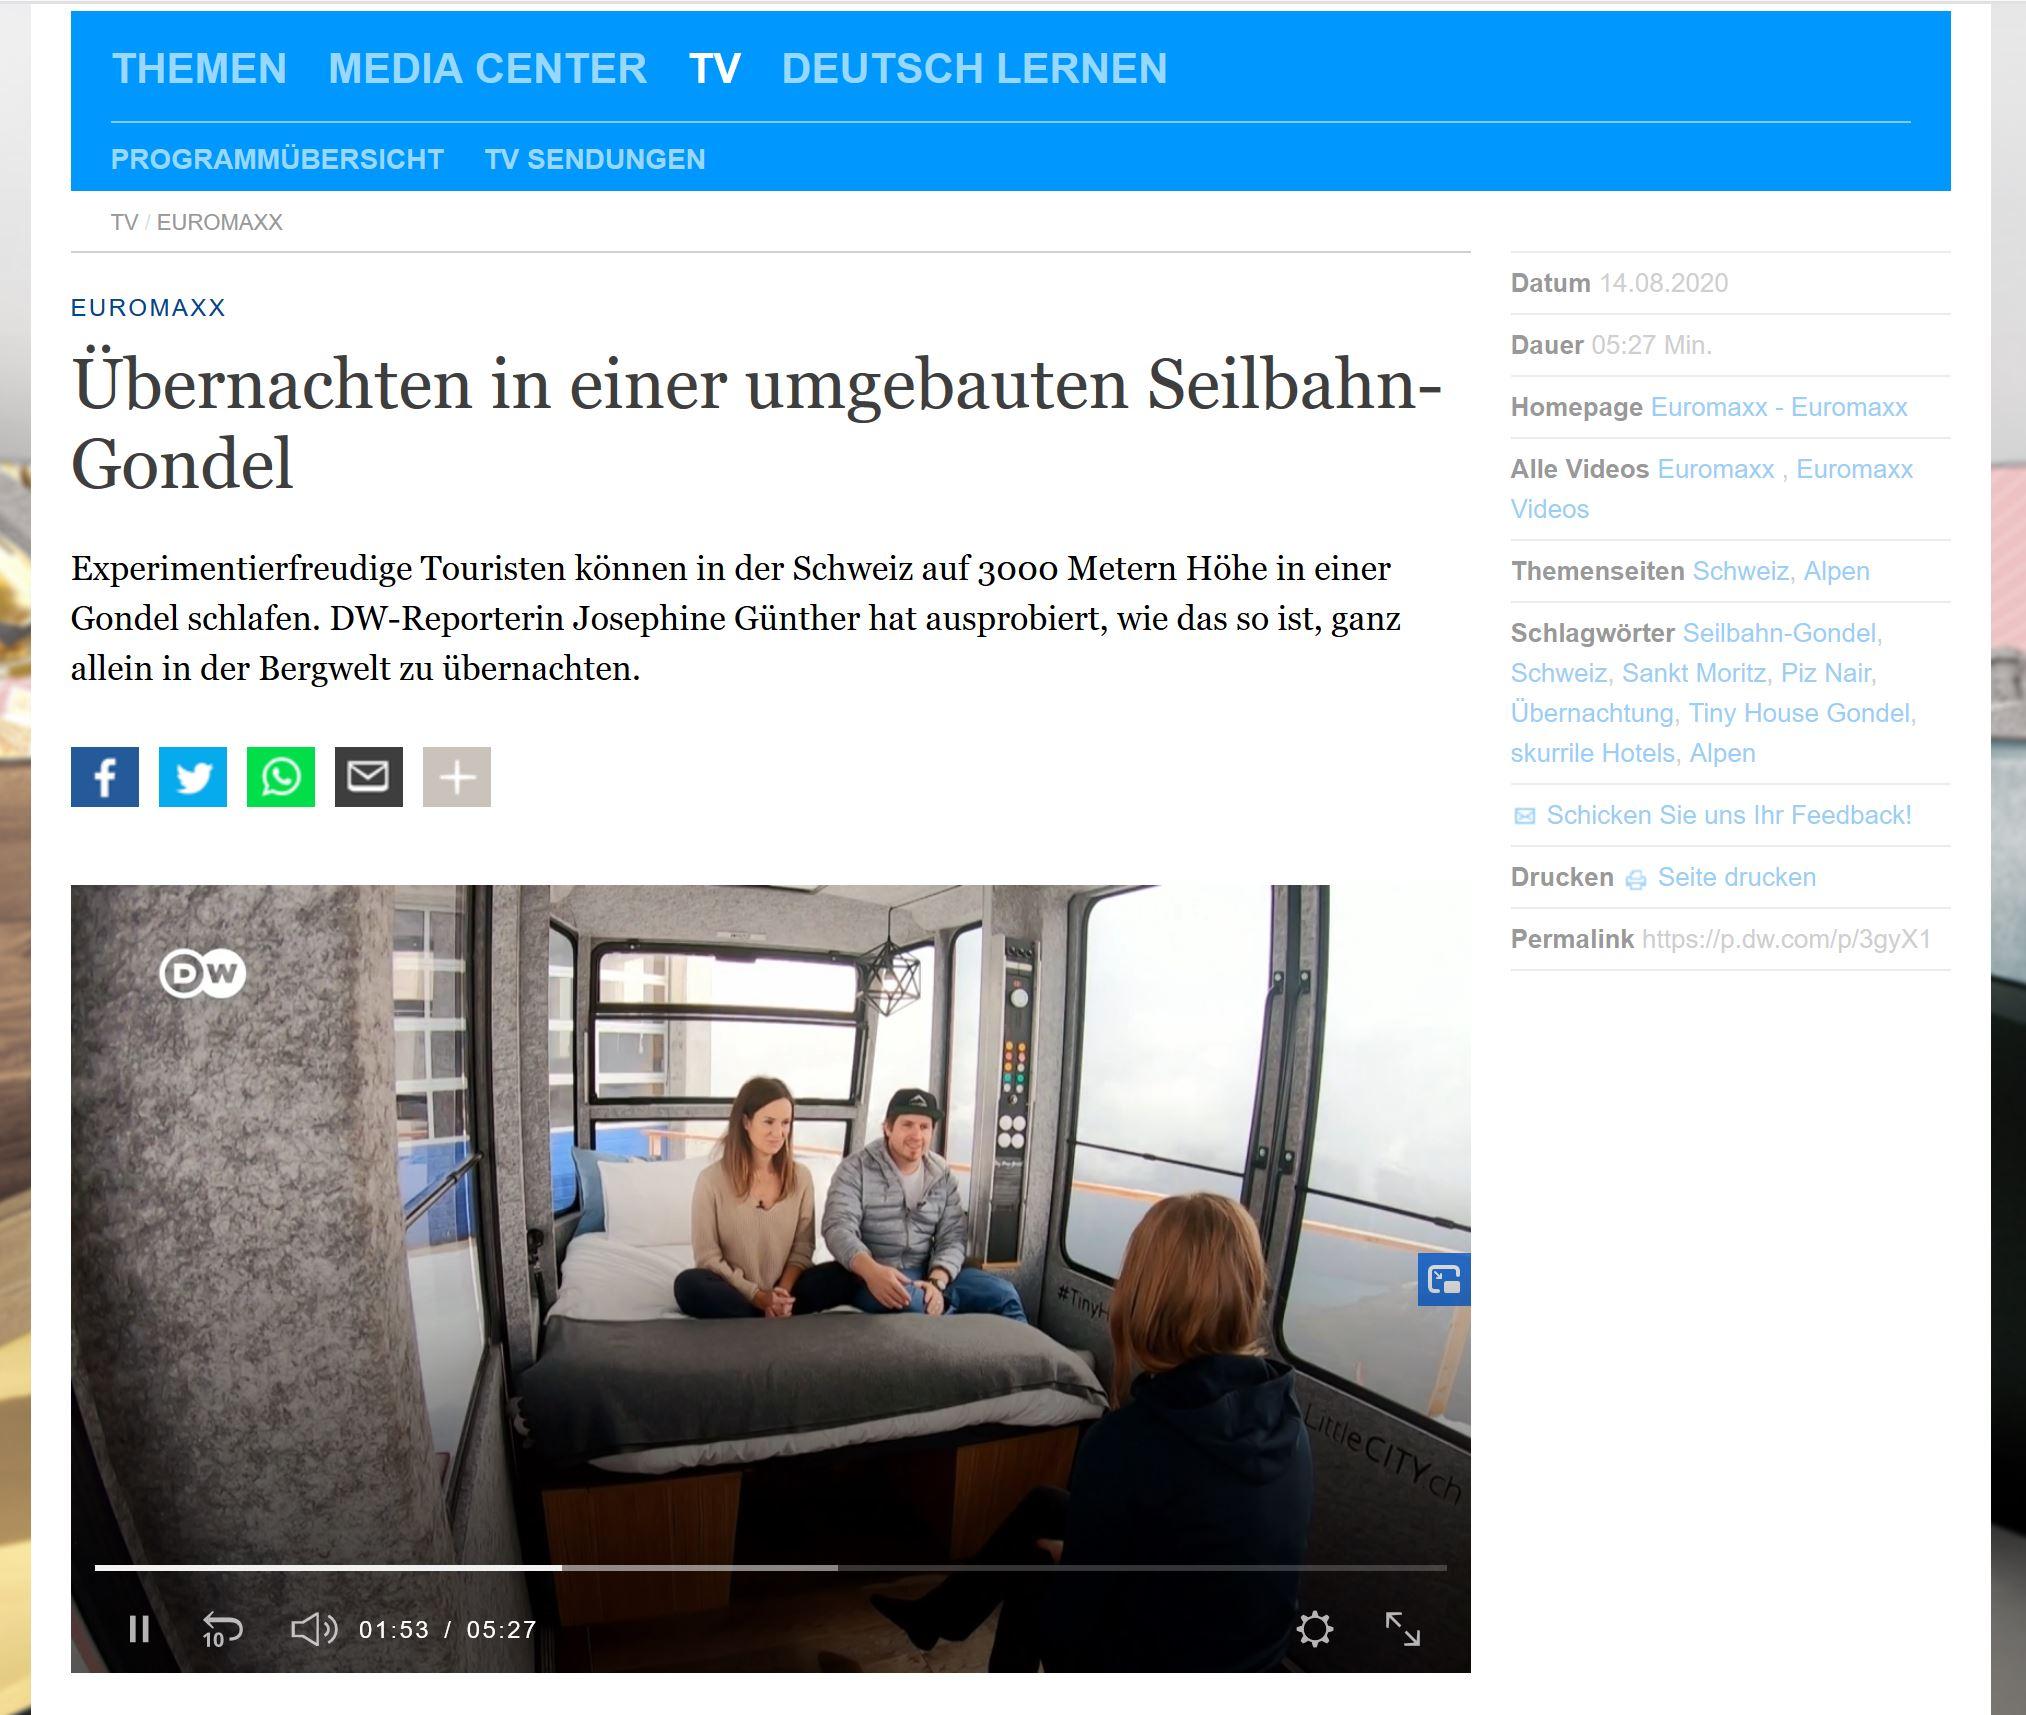 Euromaxx Tiny House Gondel Deutsche Welle DW